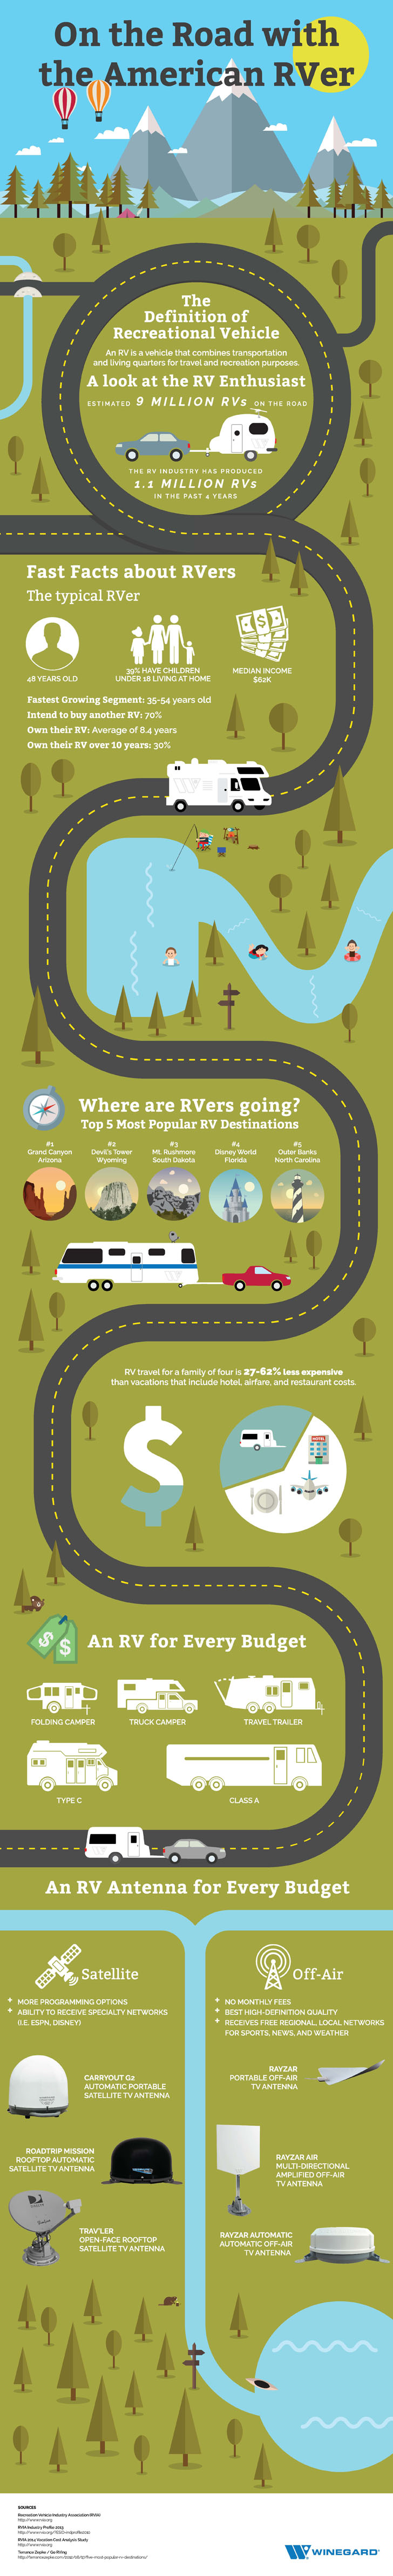 Winegard RV infographic